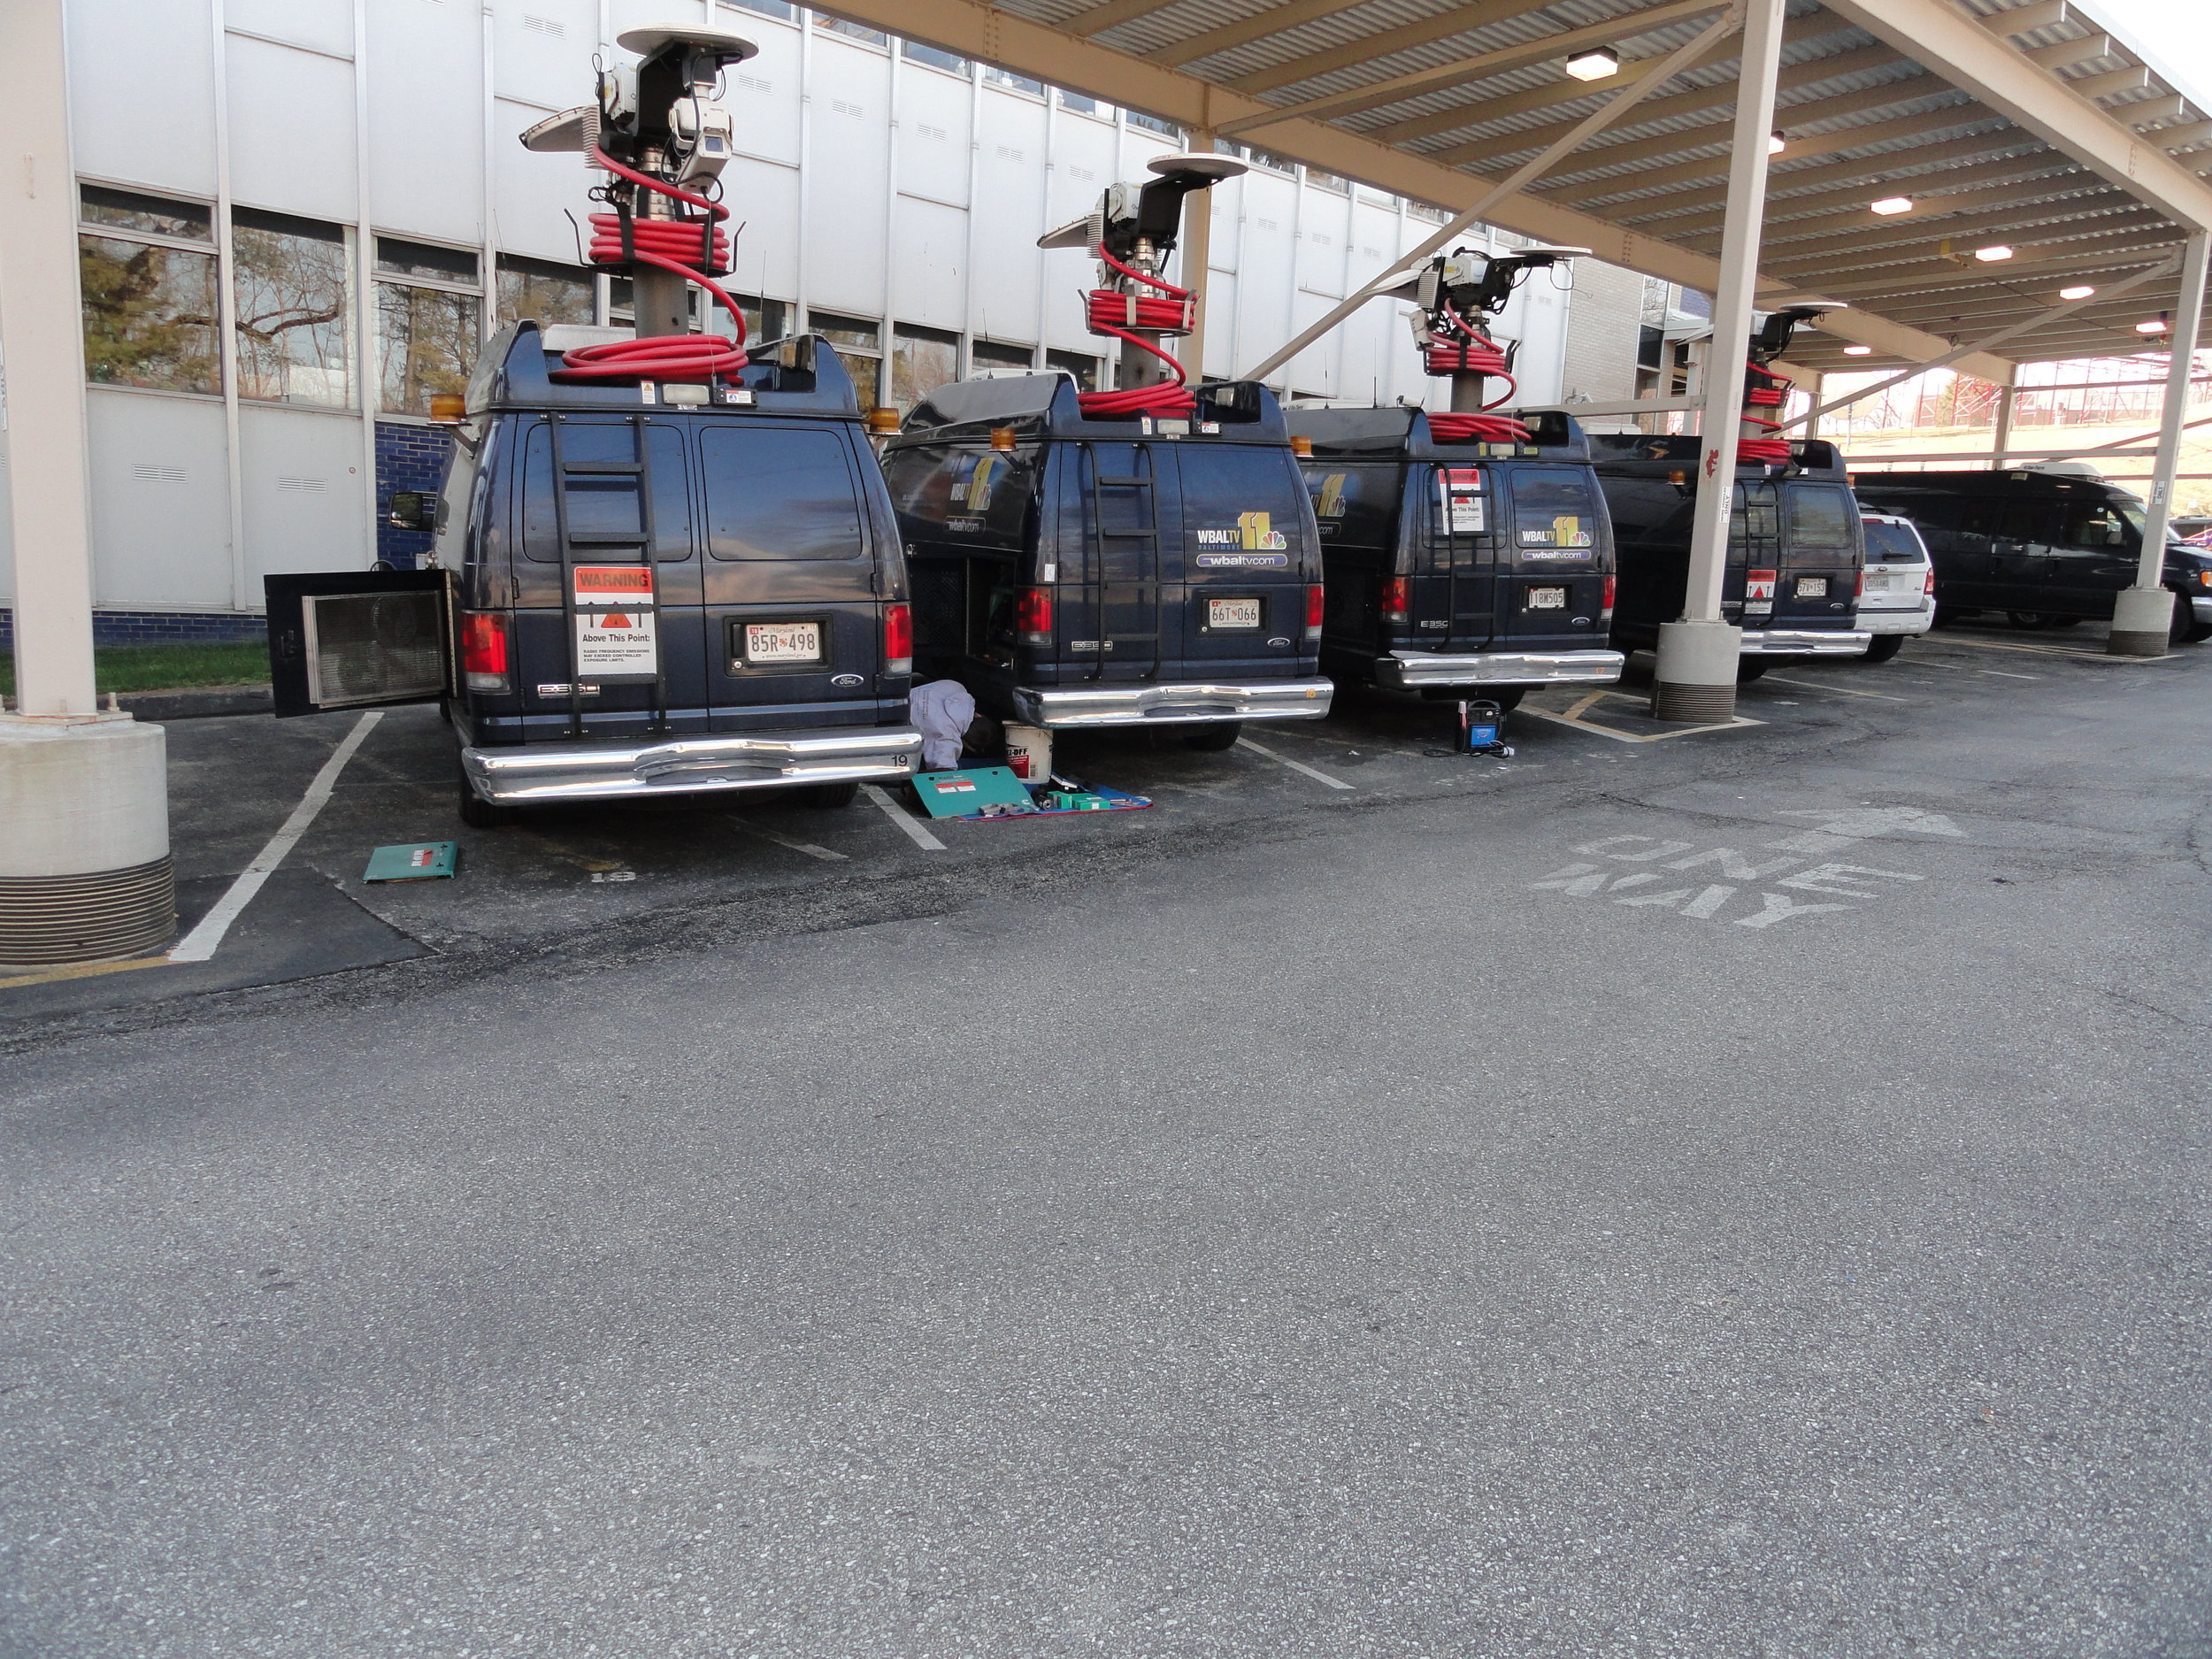 66 CVS - Service - Onsite Generator Maintenance pic #2.JPG